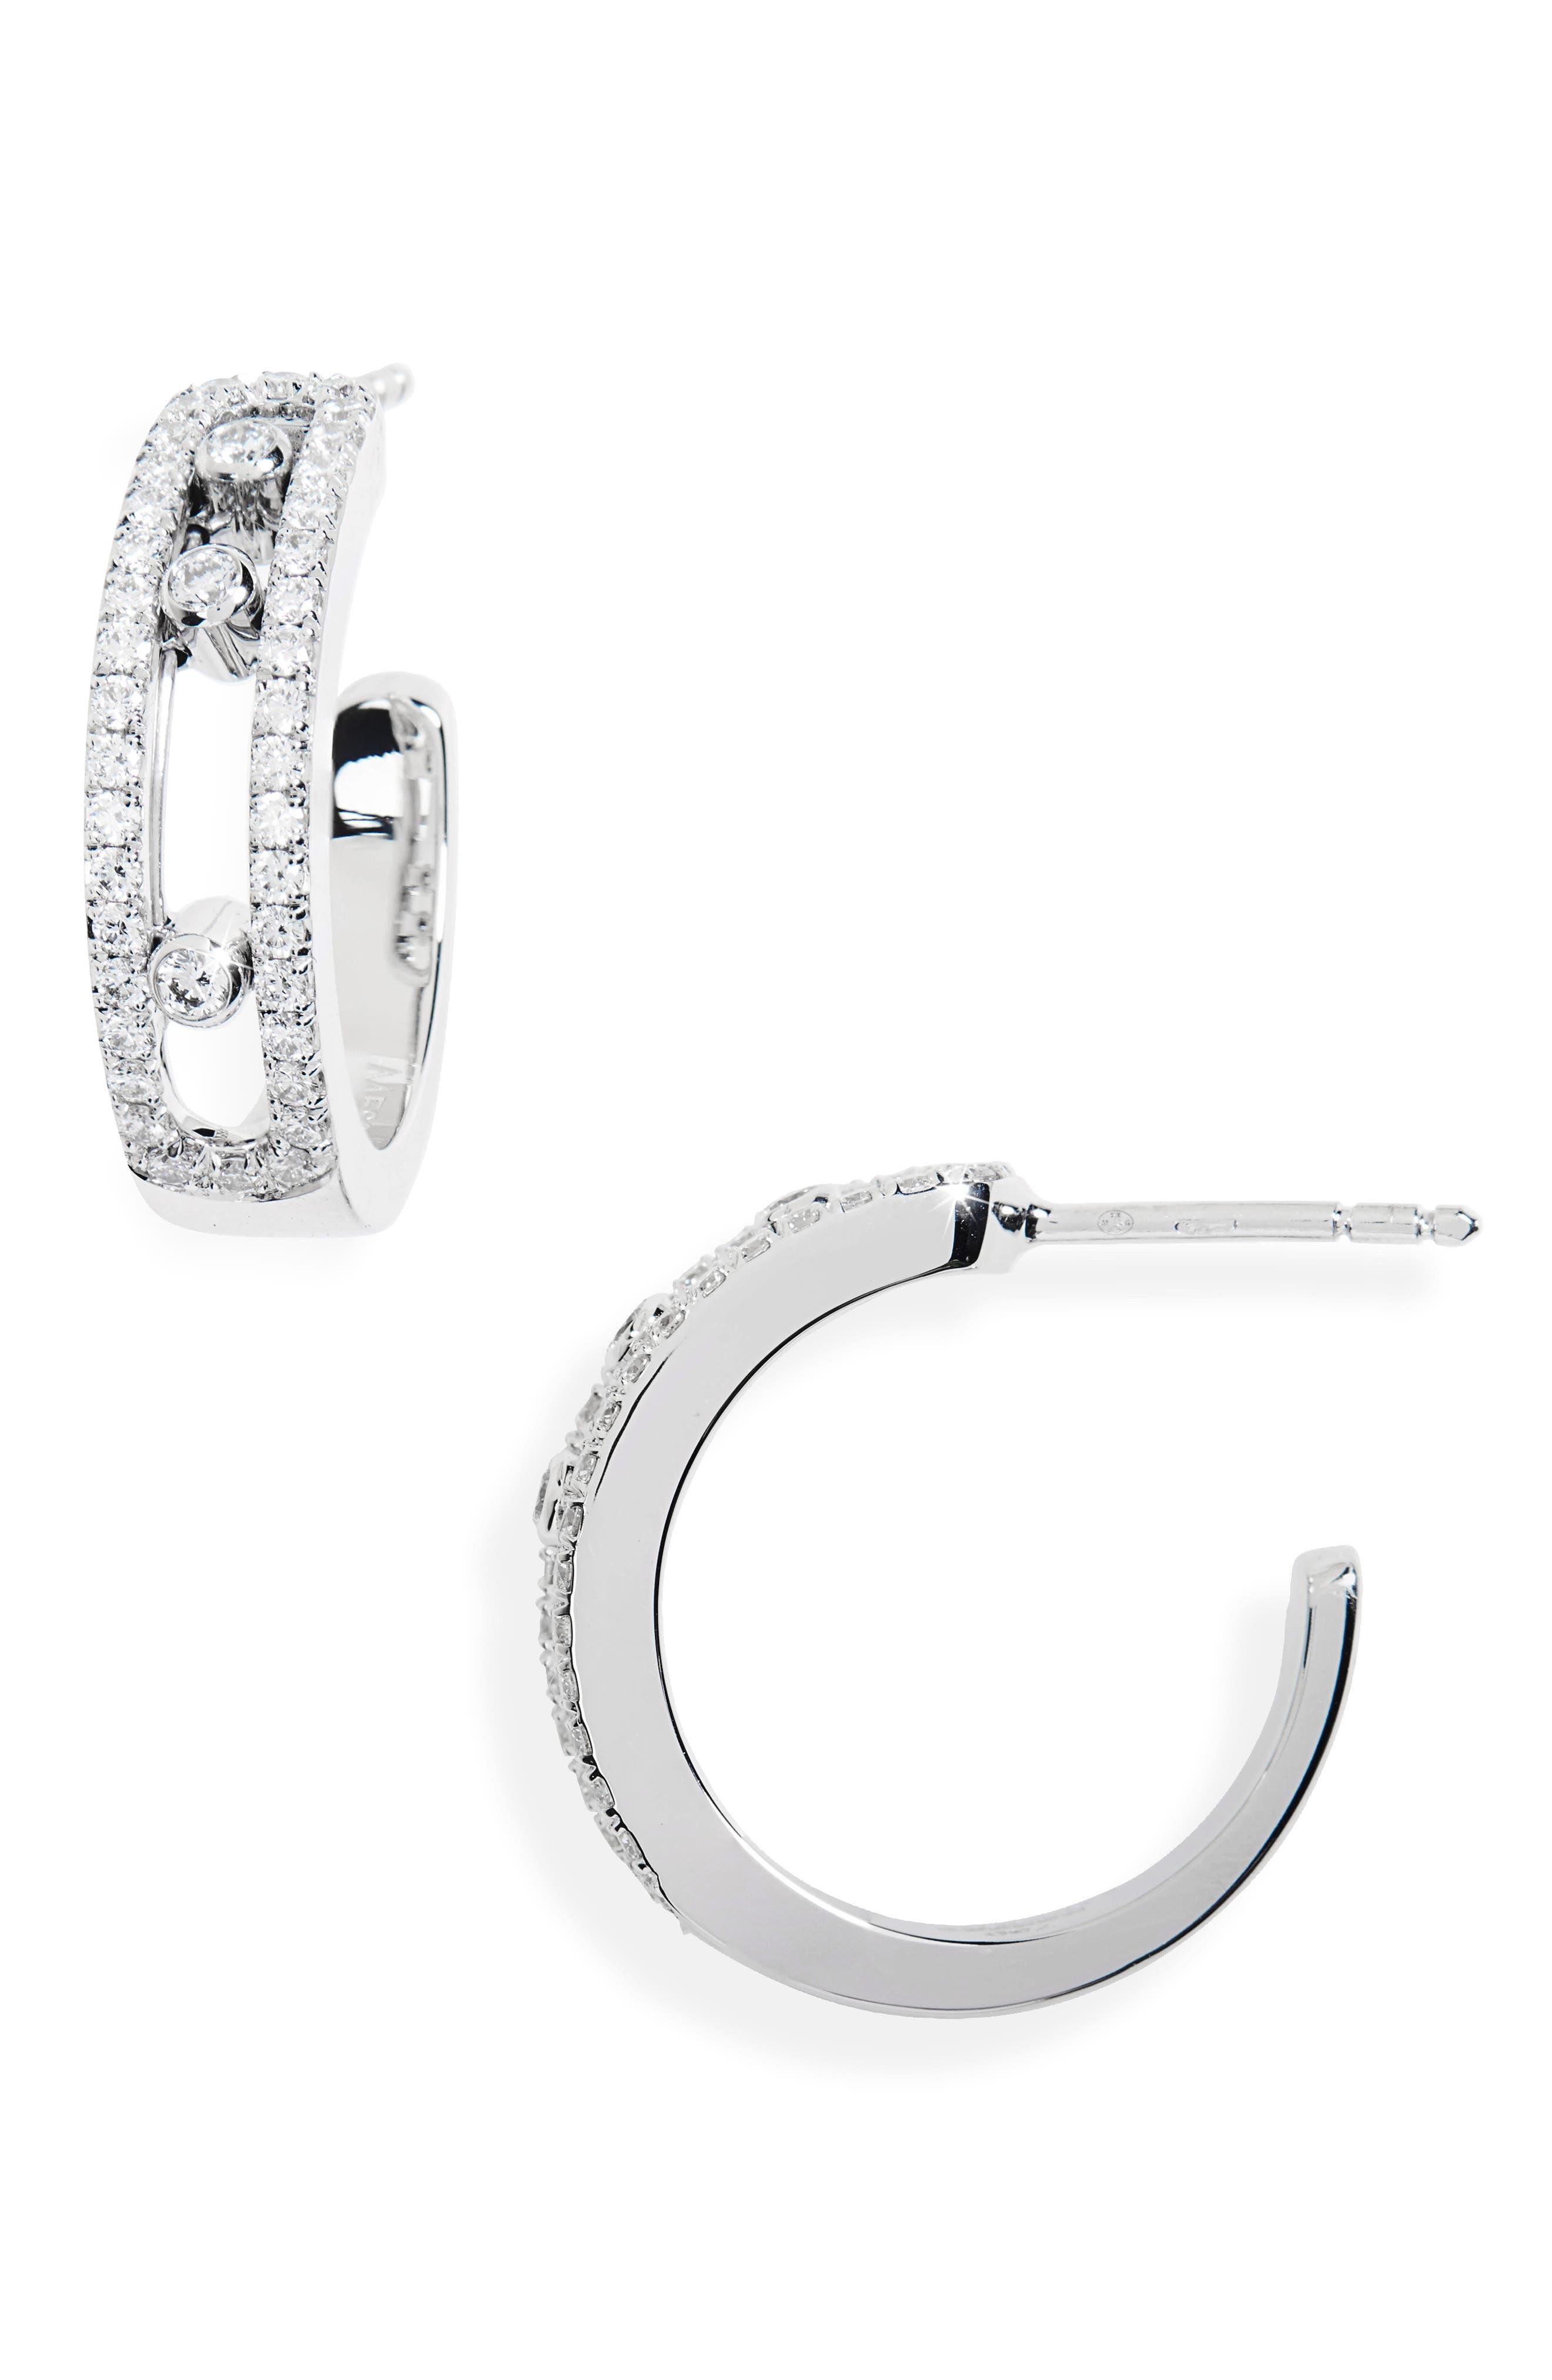 MESSIKA Move Diamond Hoop Earrings in White